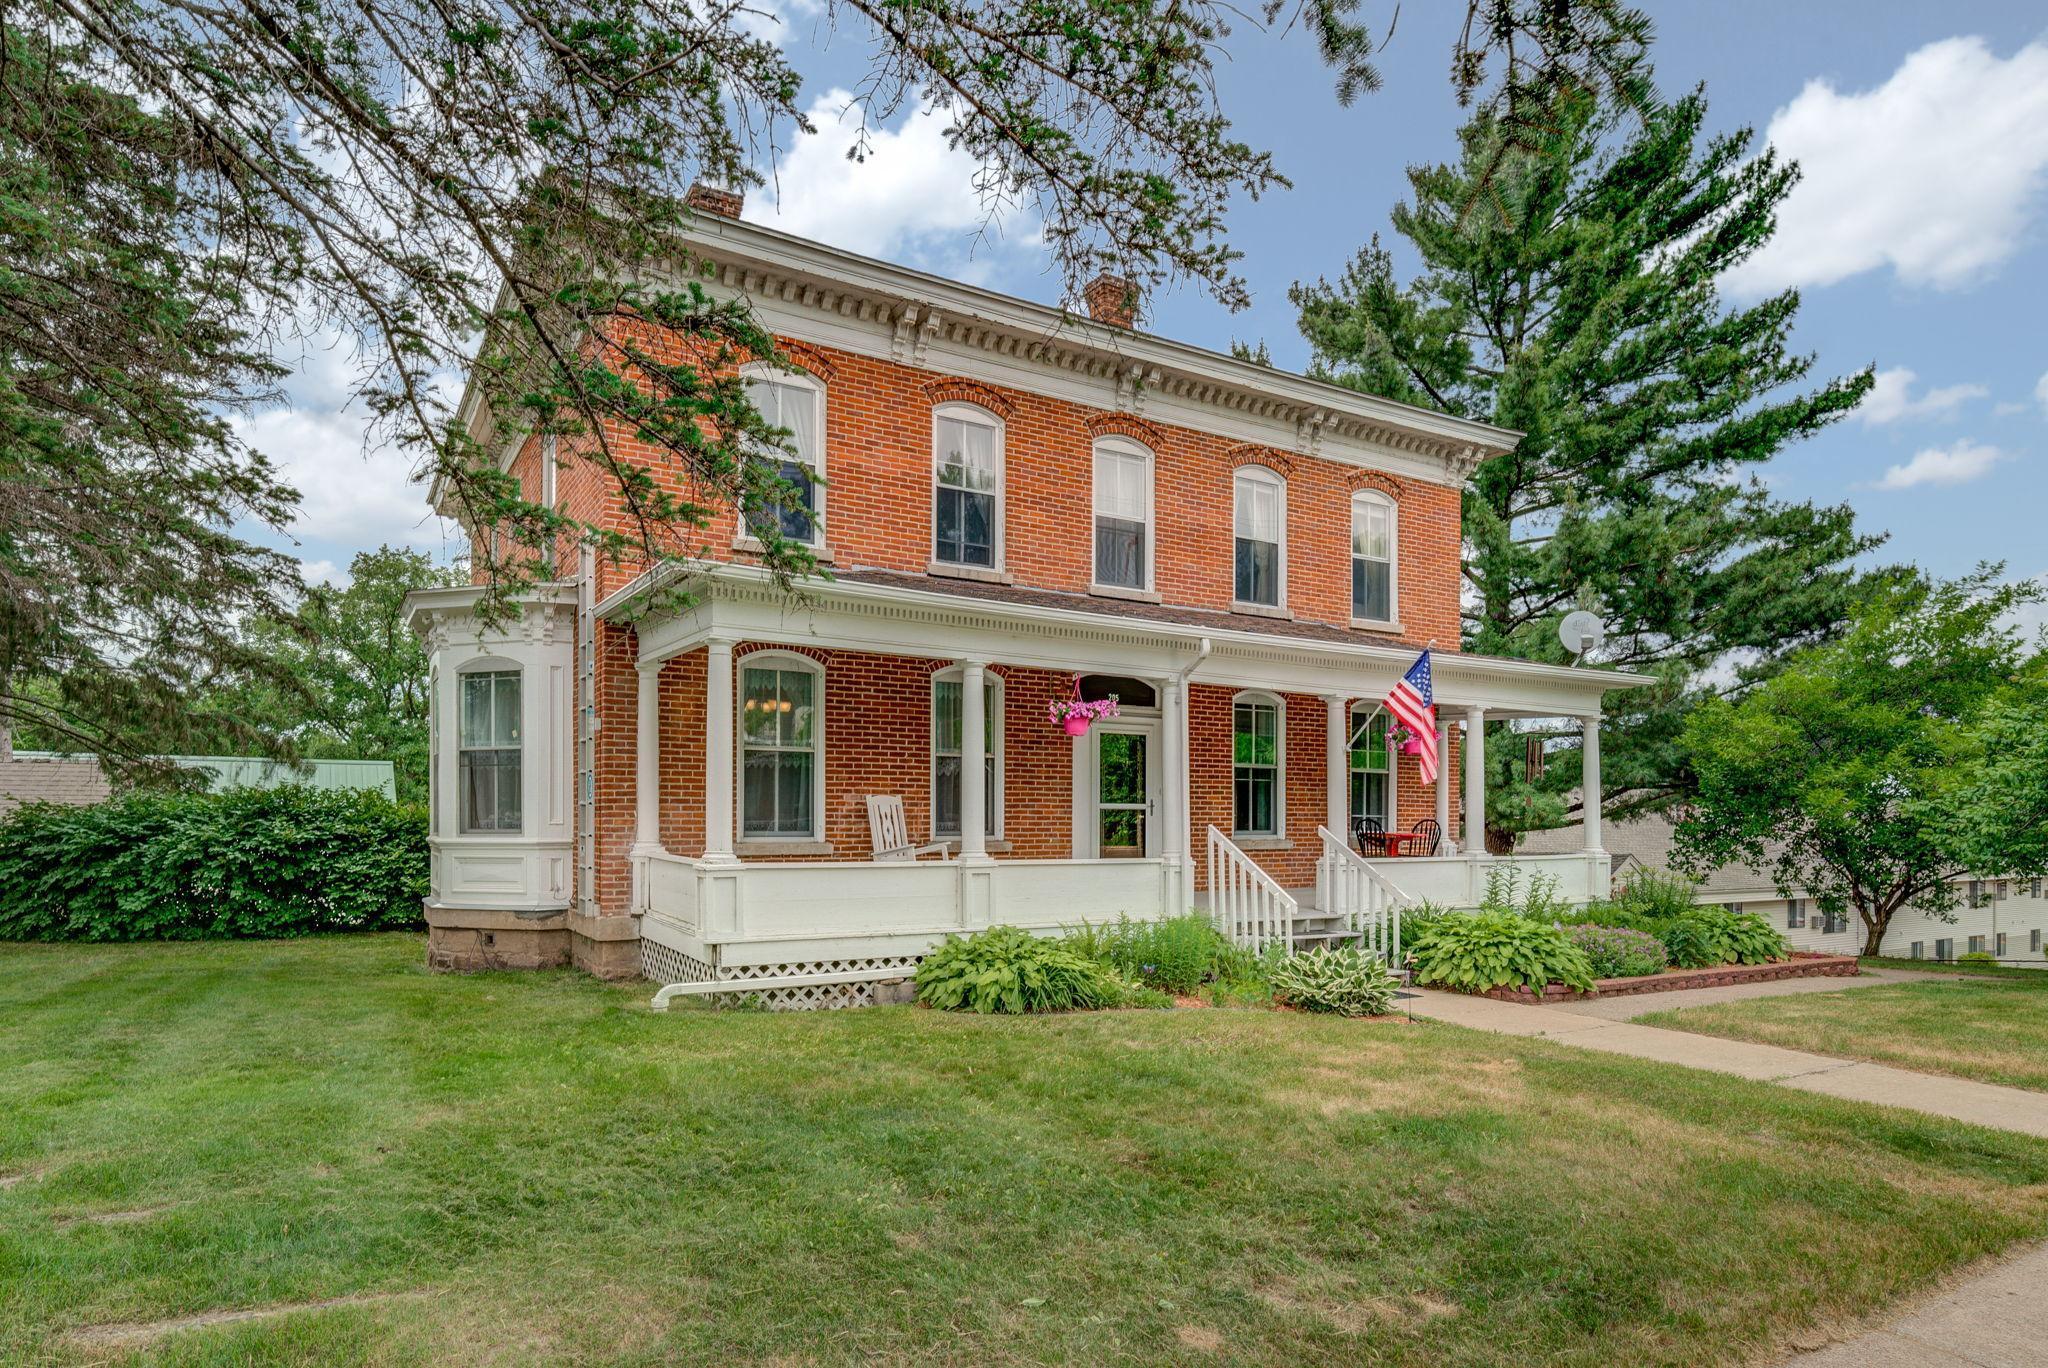 205 S Adams Property Photo - Saint Croix Falls, WI real estate listing